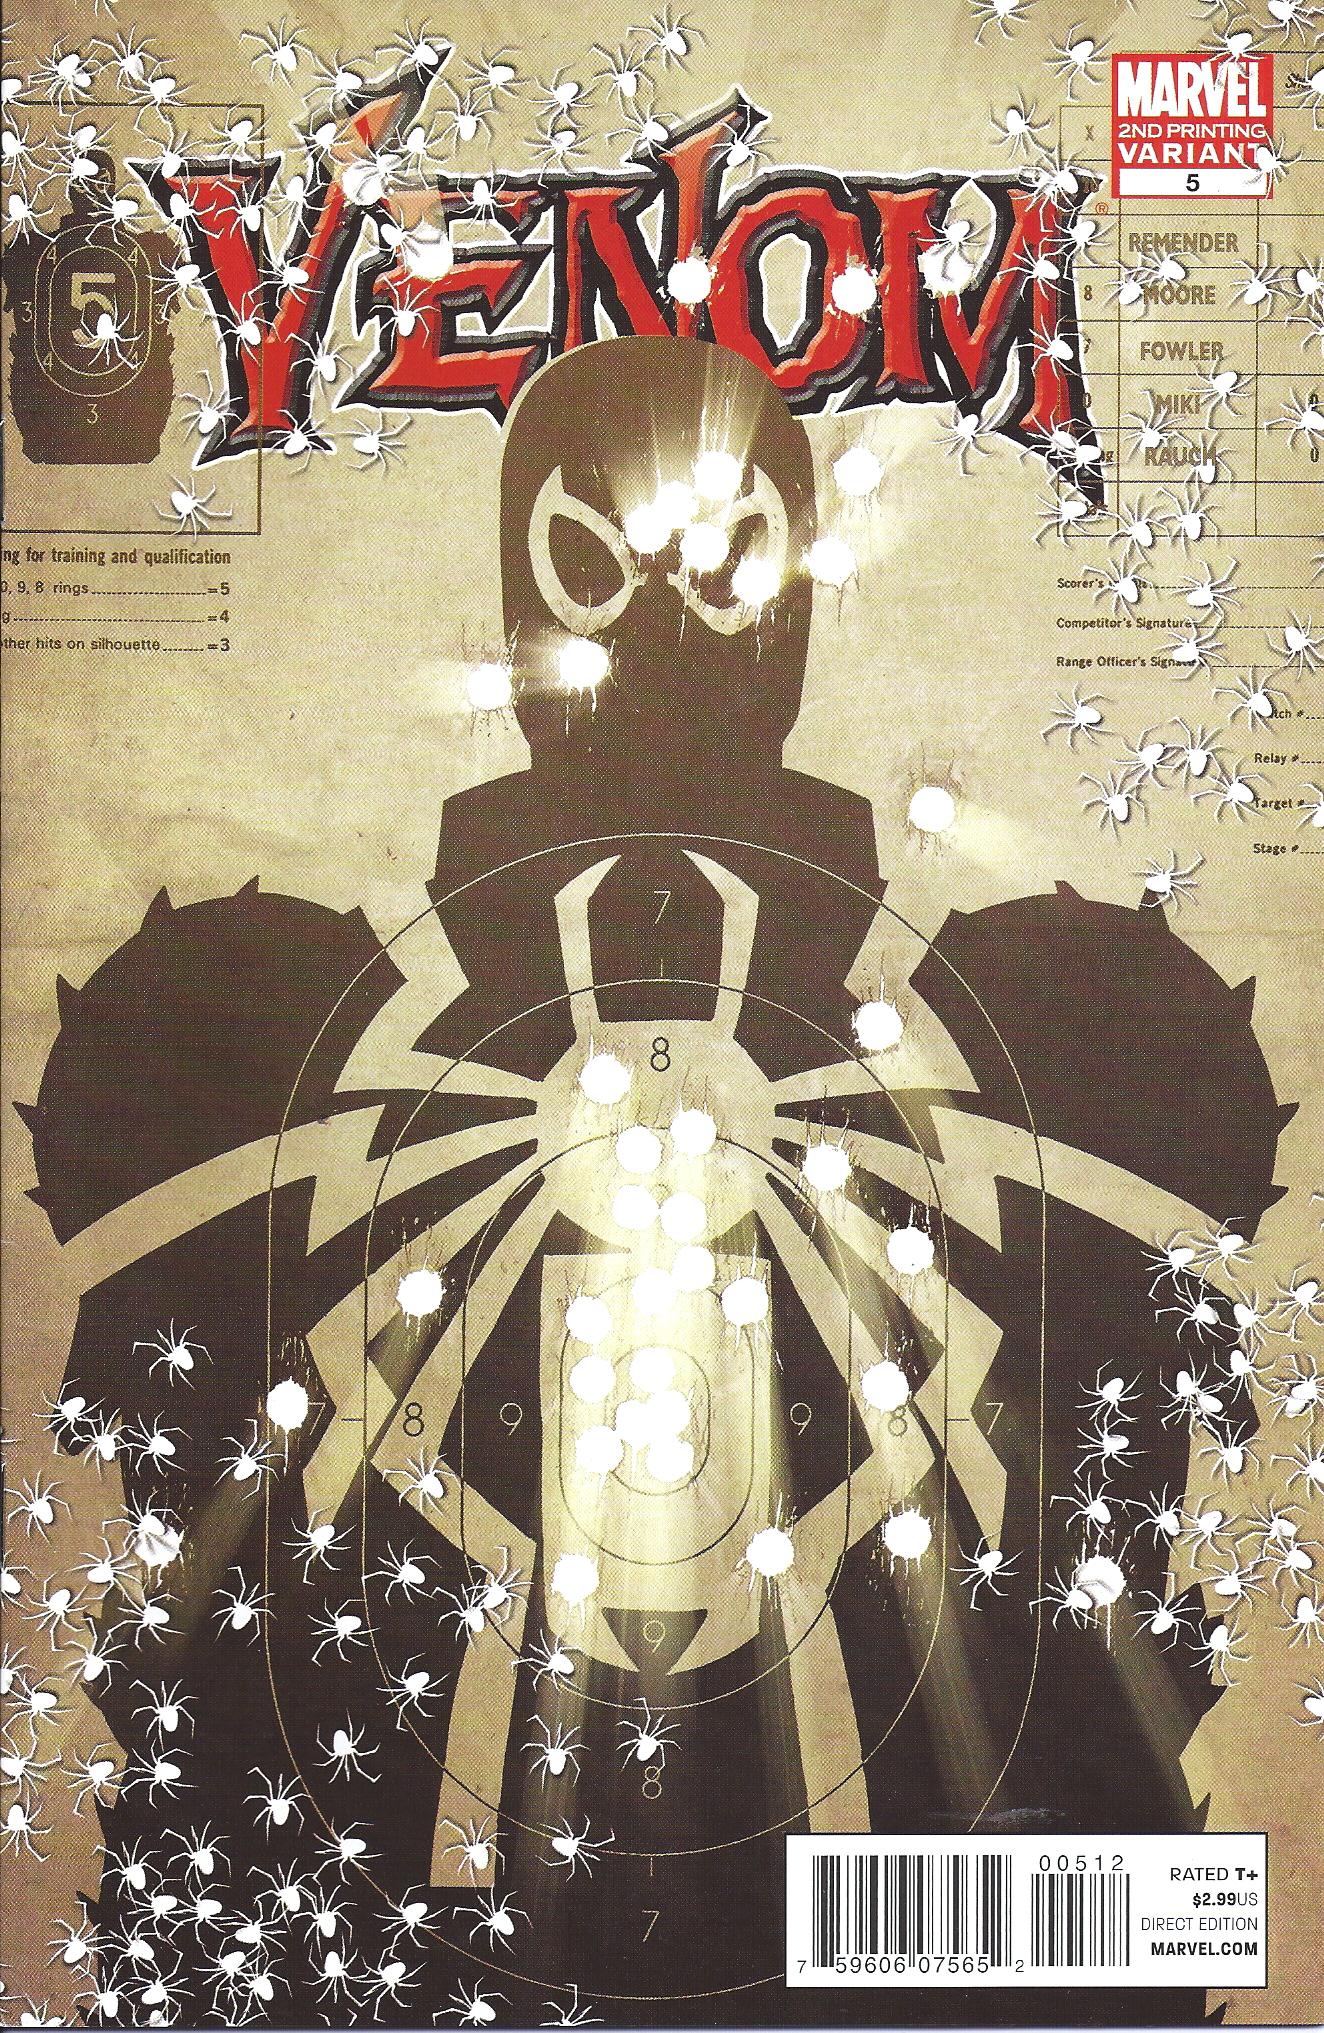 Venom Vol 2 5 Variant 2nd Printing.jpg